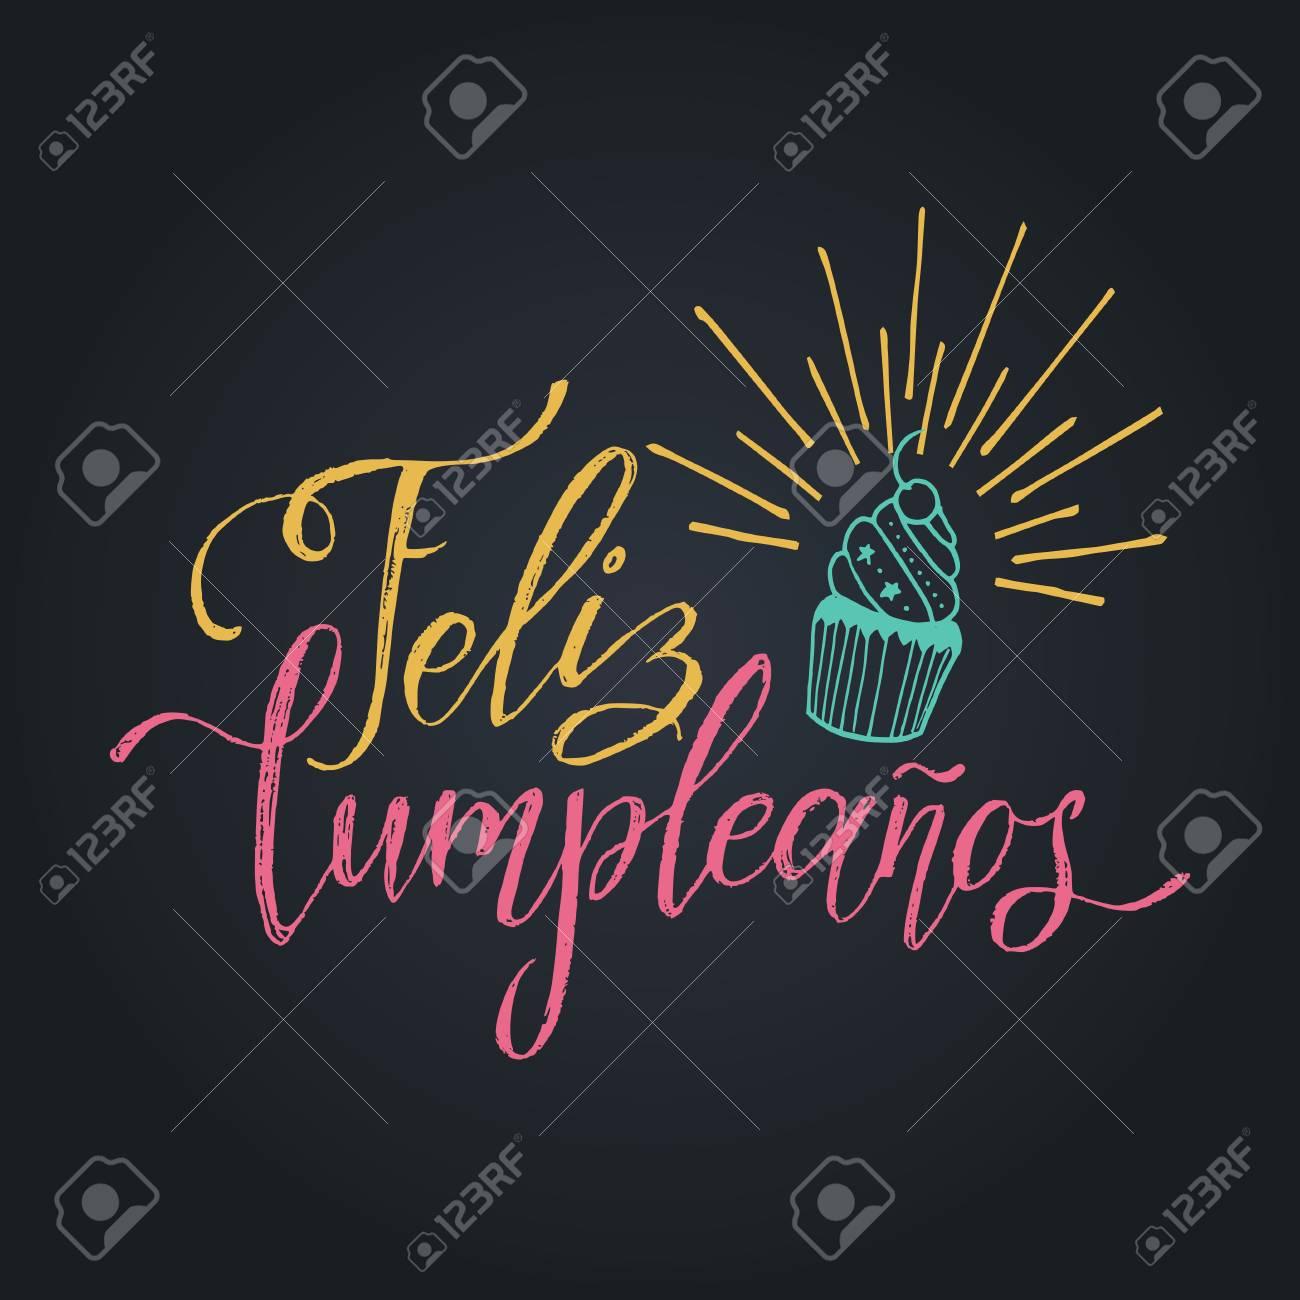 Vector Feliz Cumpleanos Translated Happy Birthday Lettering